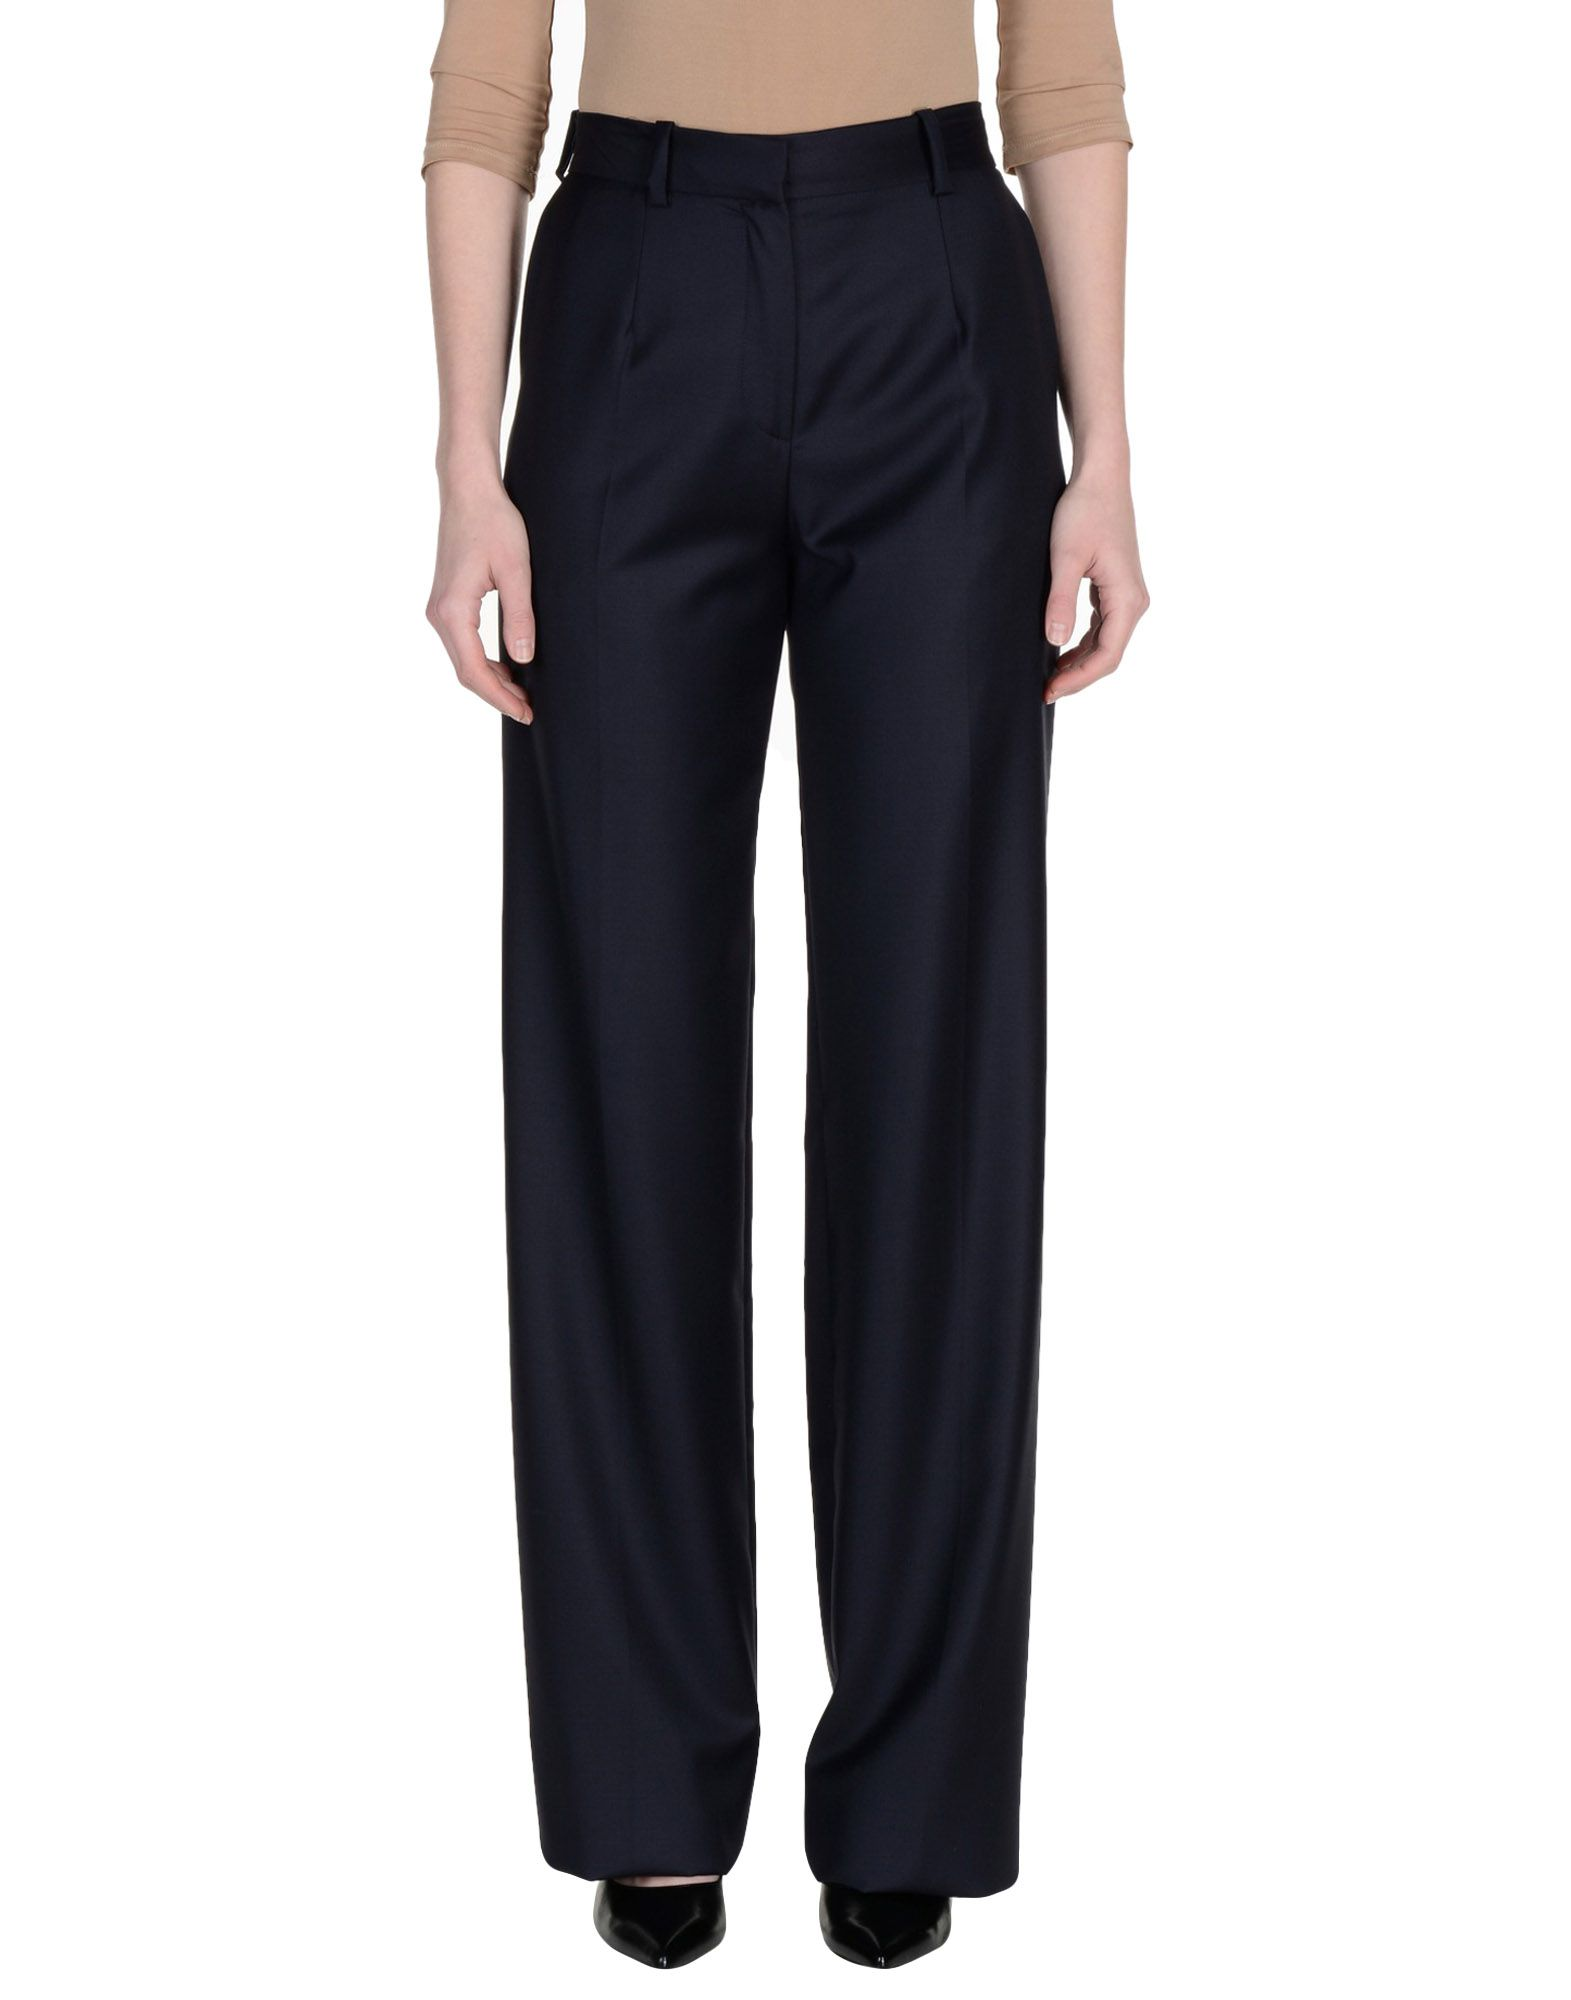 INES DE LA FRESSANGE Casual Pants in Dark Blue